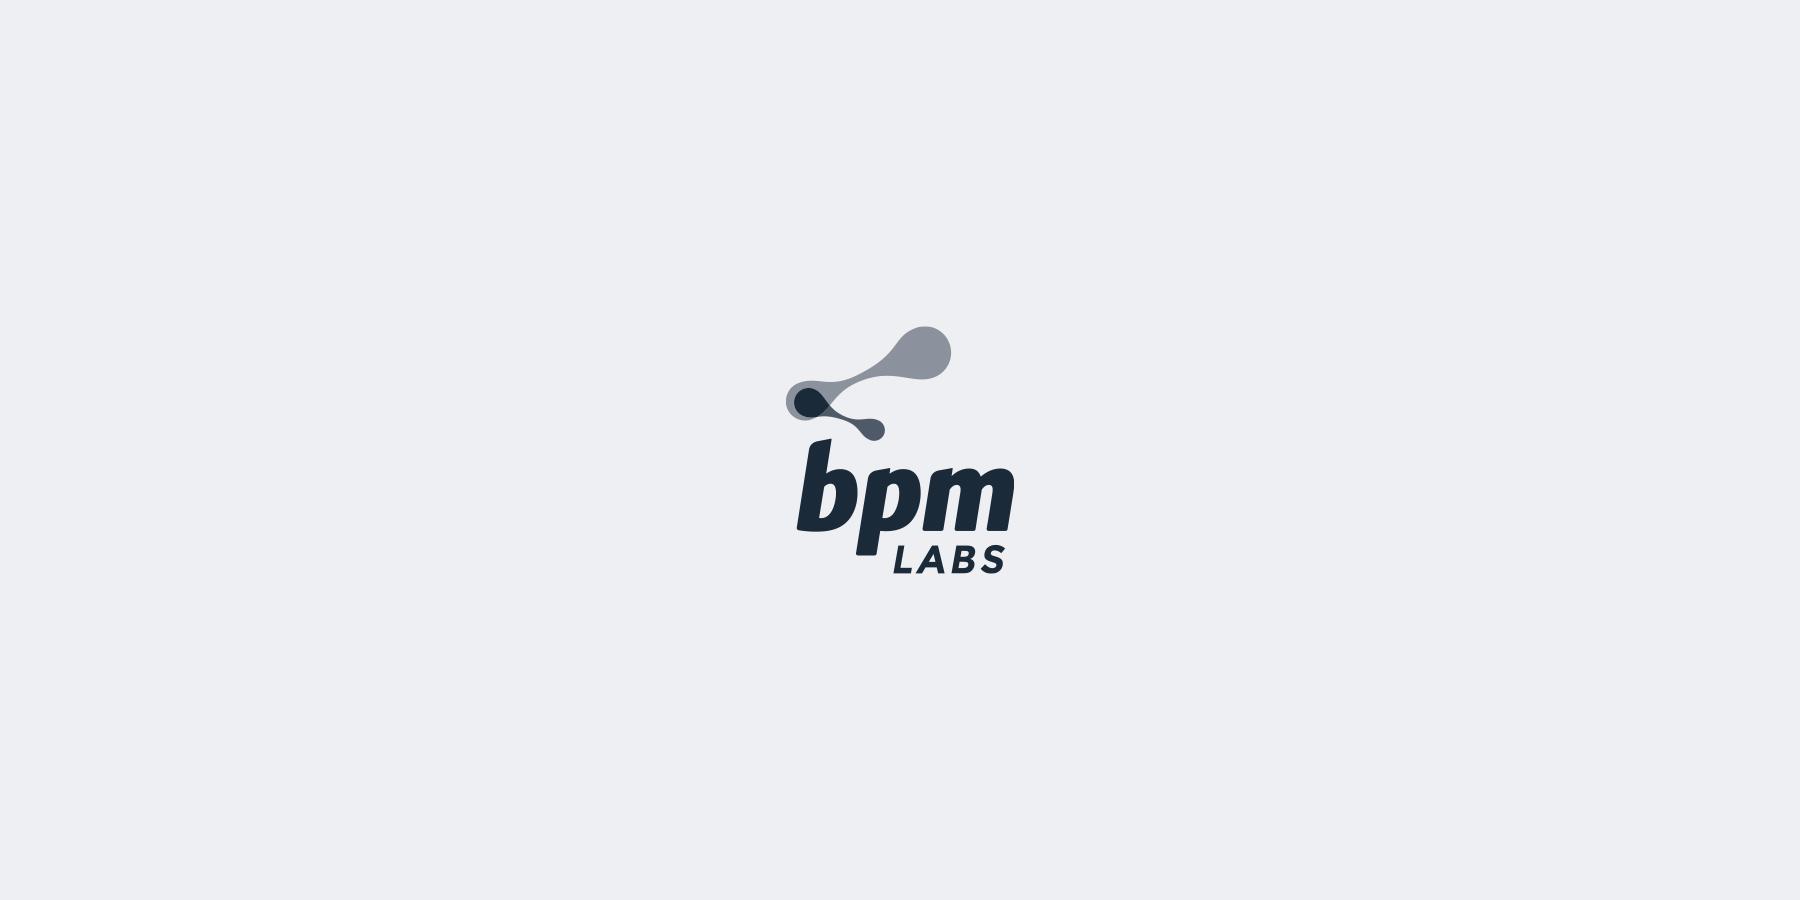 BPM Labs